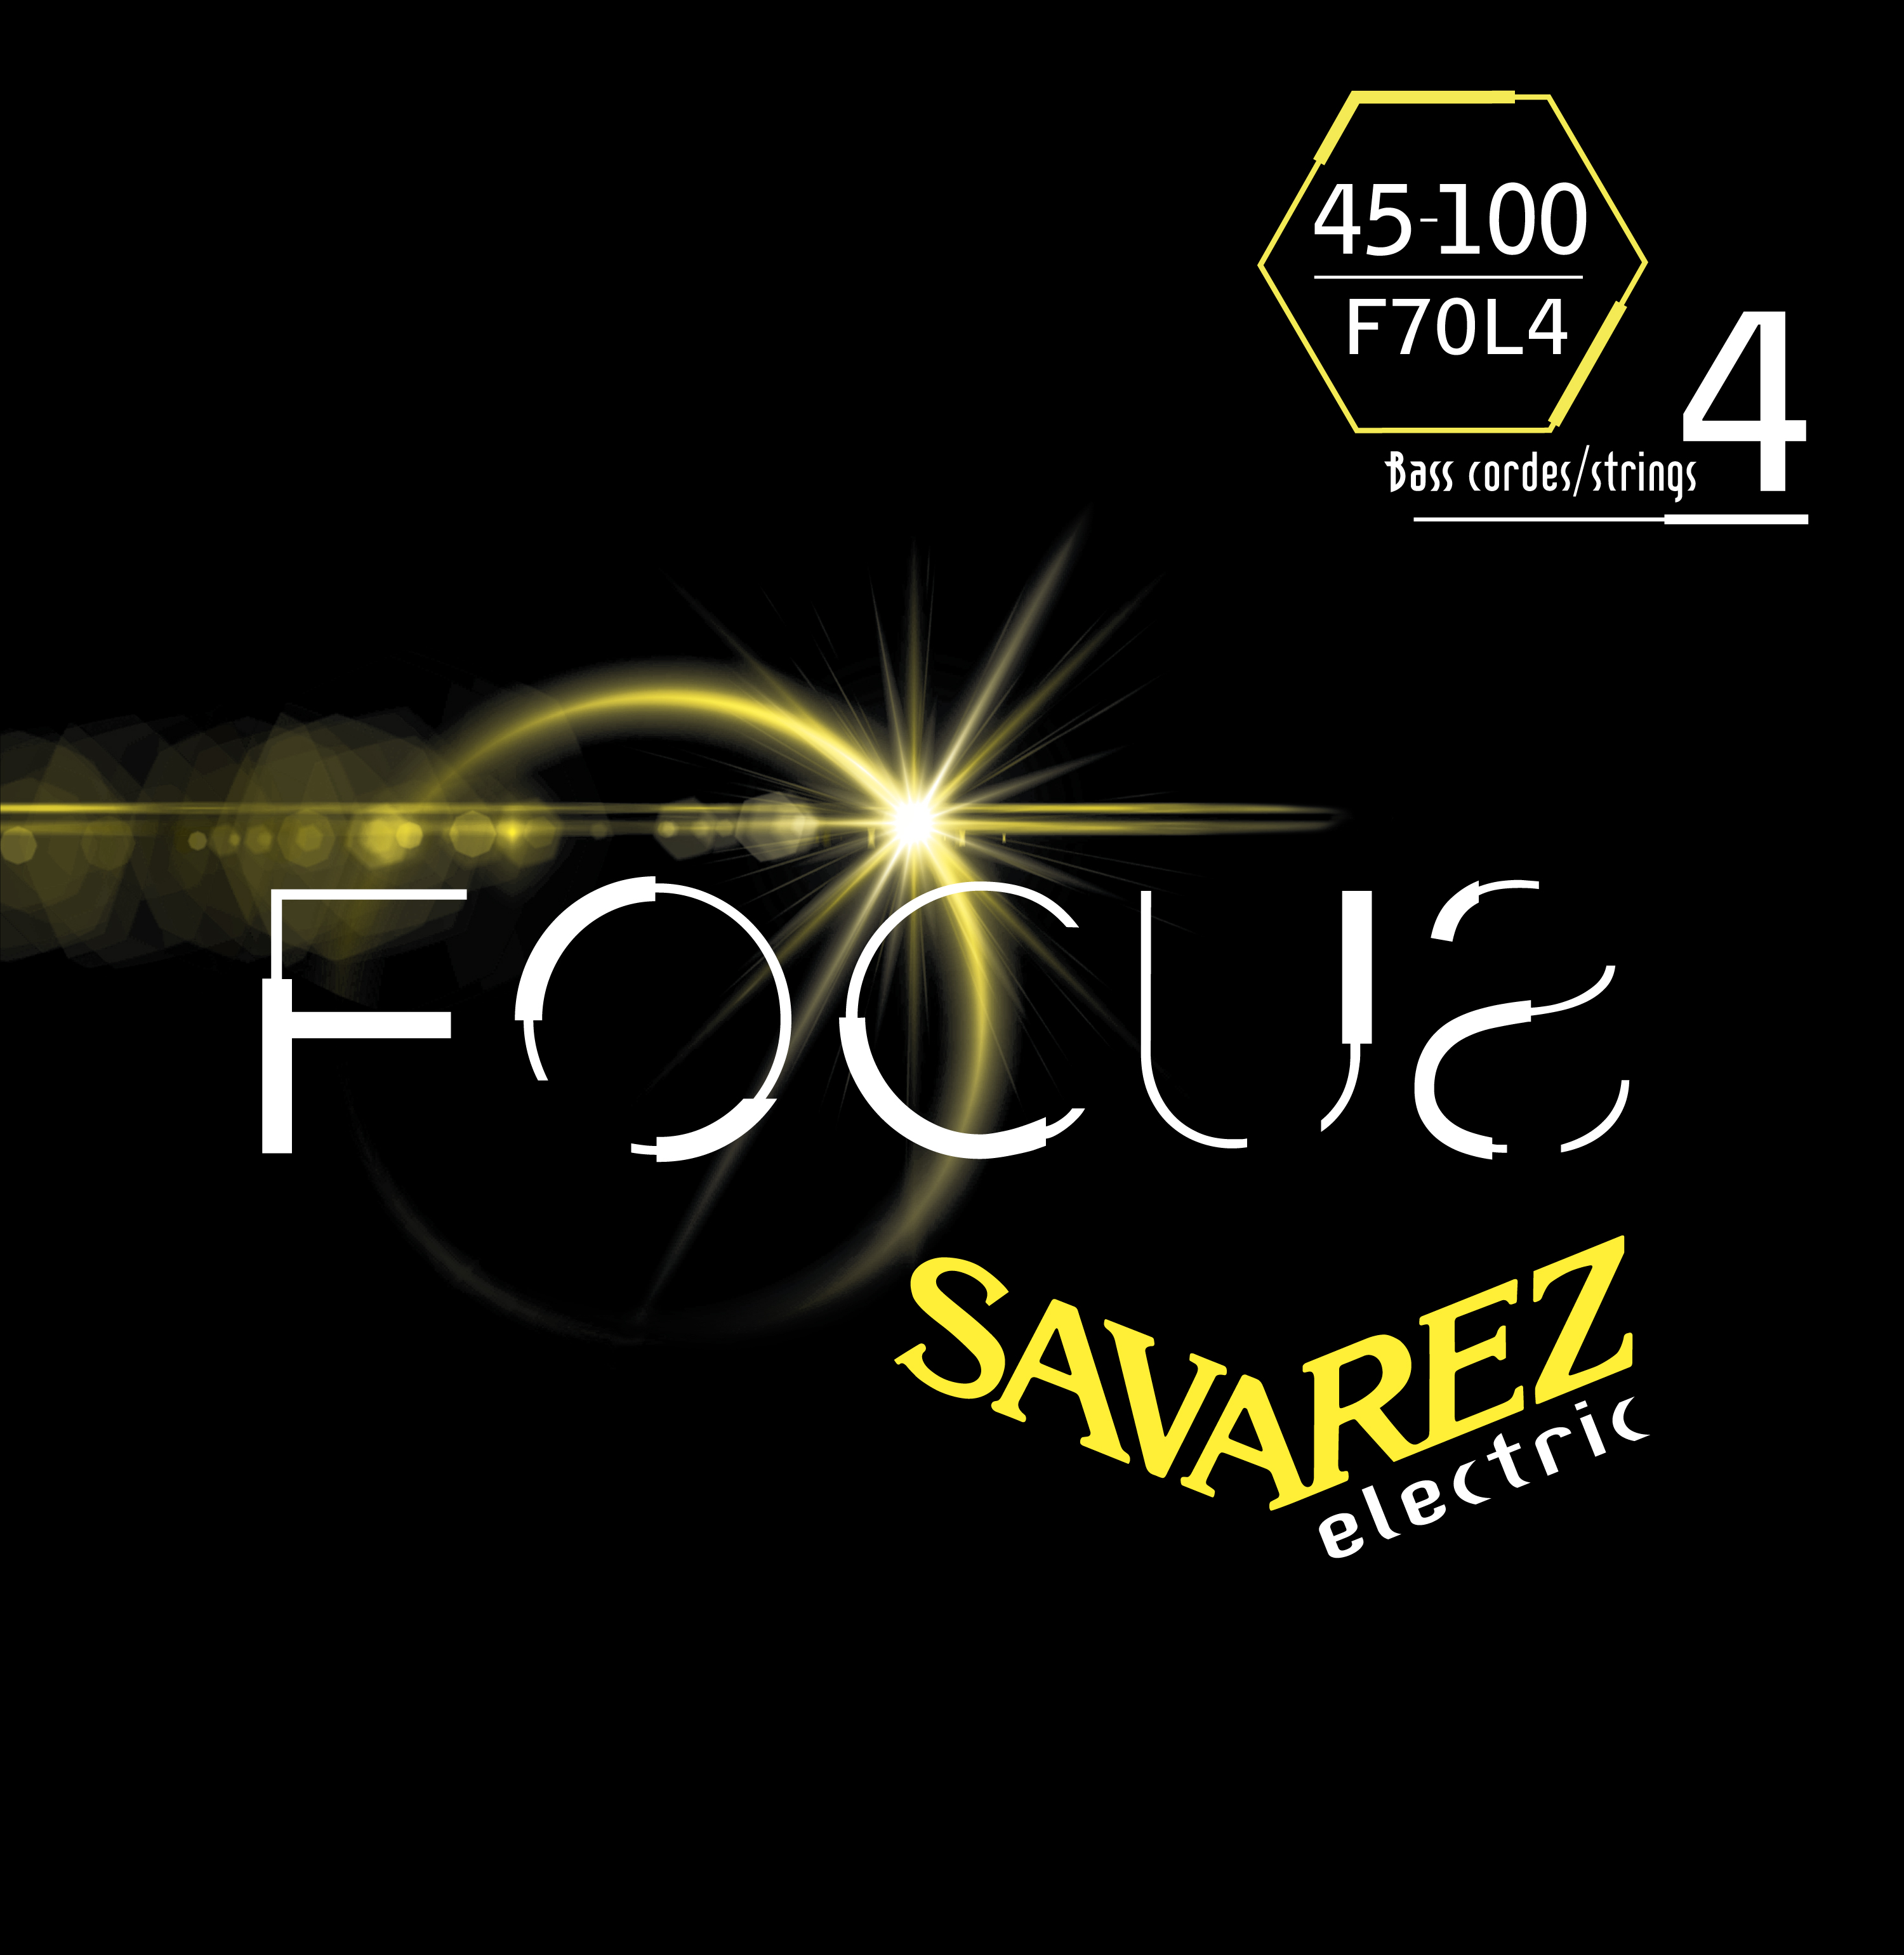 SAVAREZ ELECTRIC FOCUS F70L4